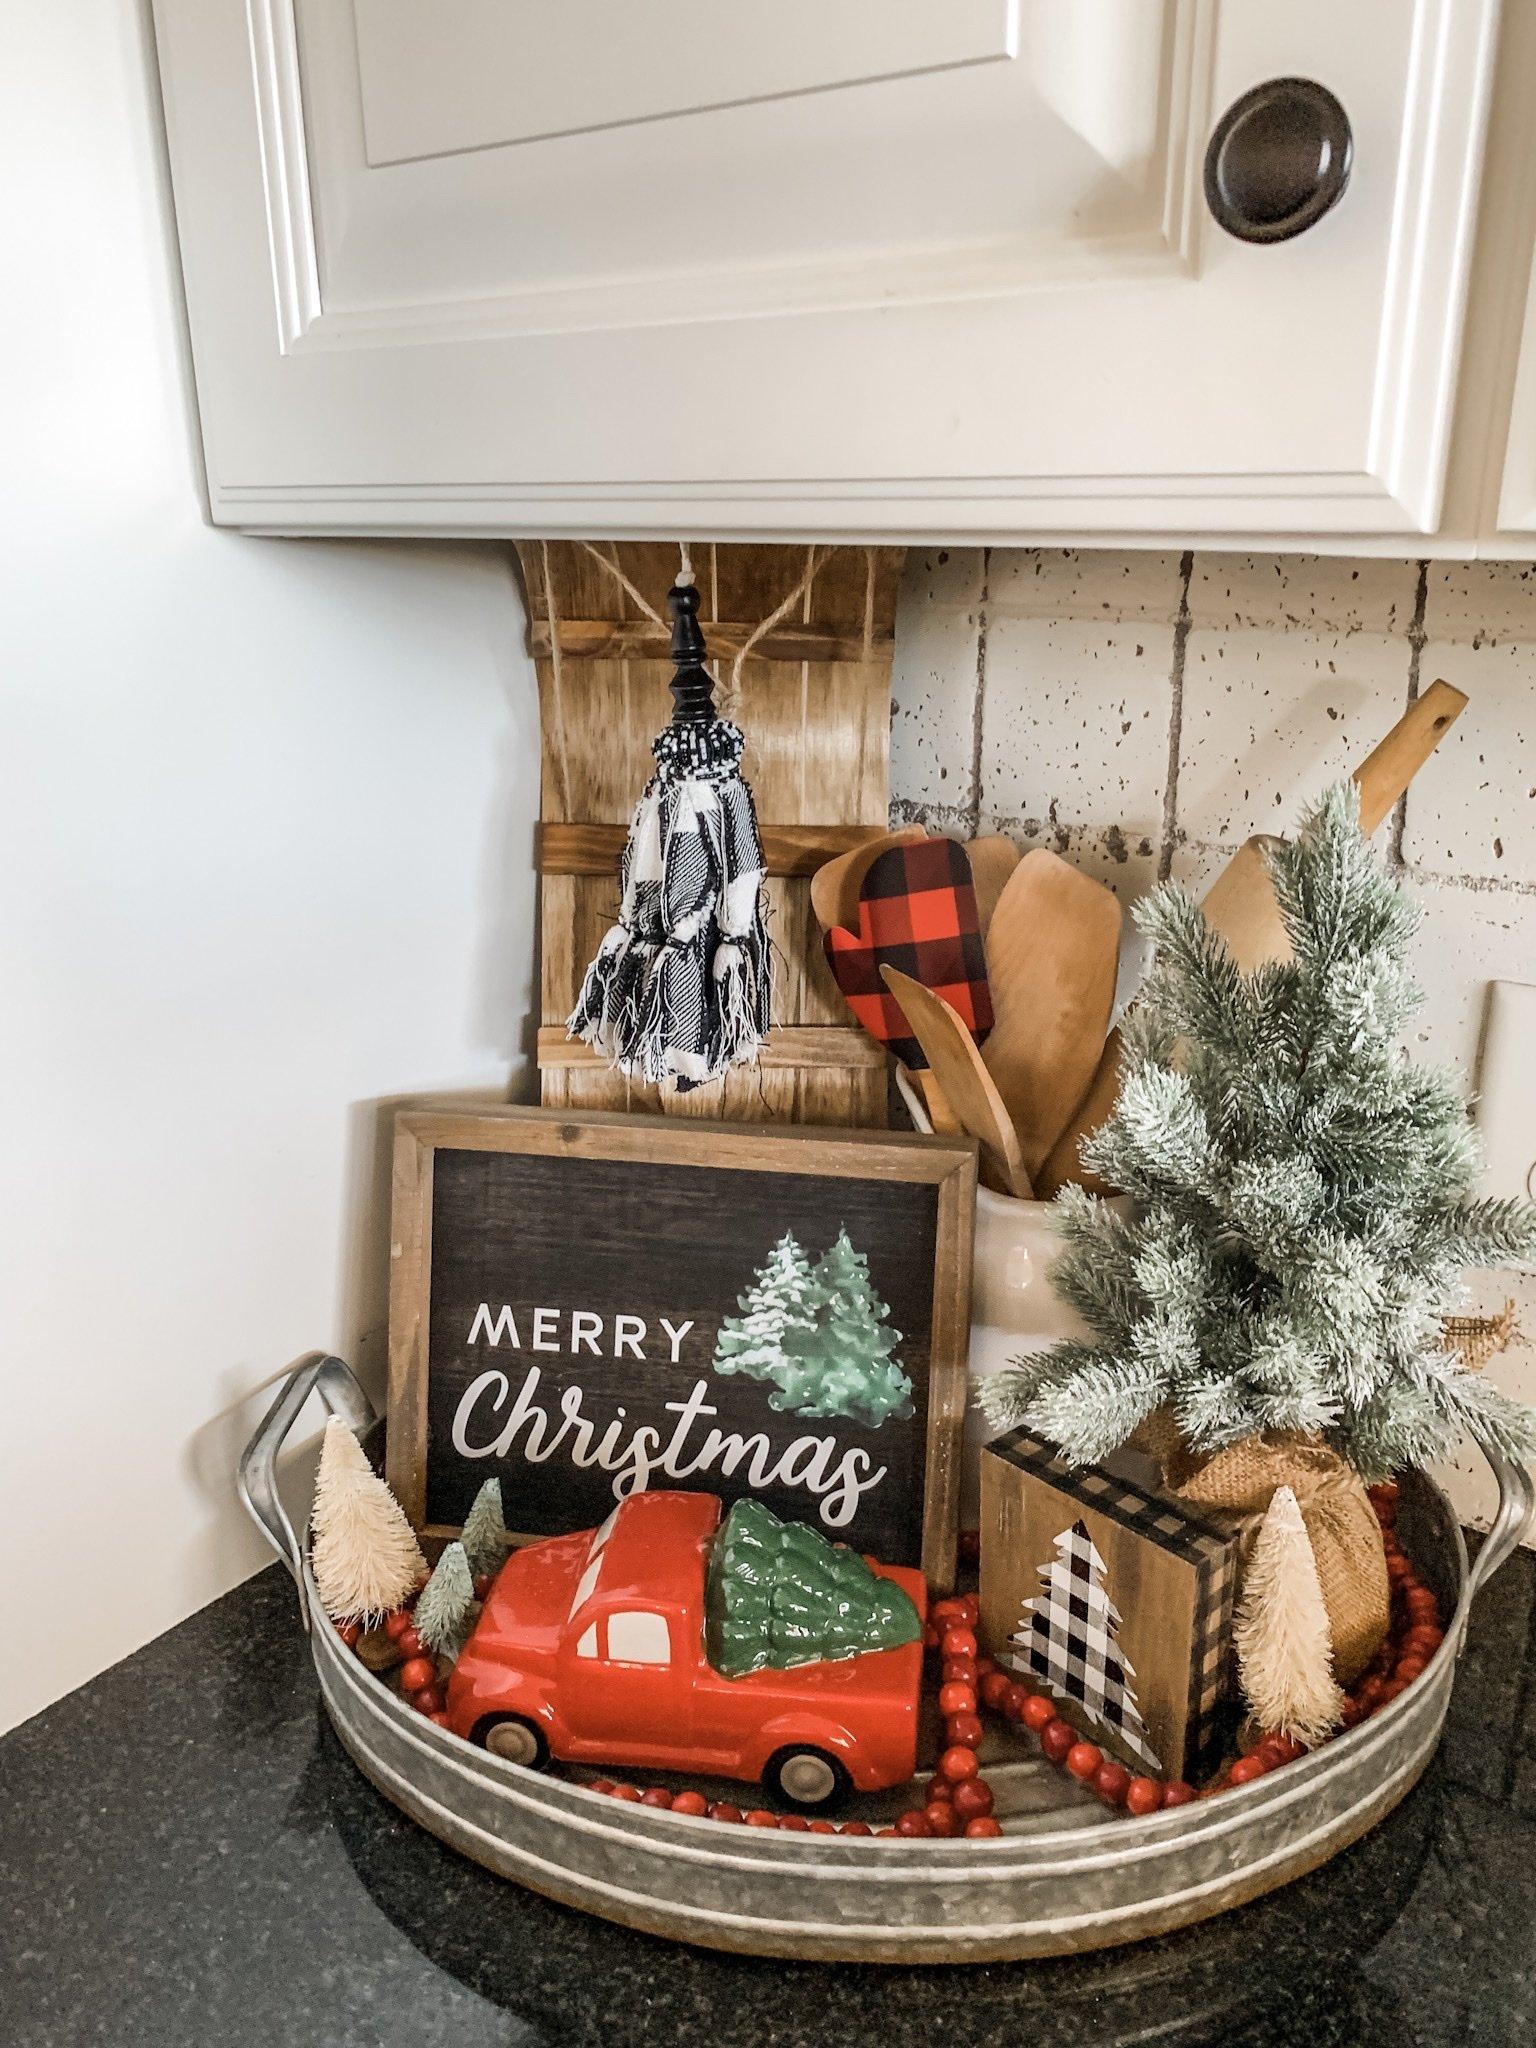 Christmas tray ideas for inspiration this holiday season!